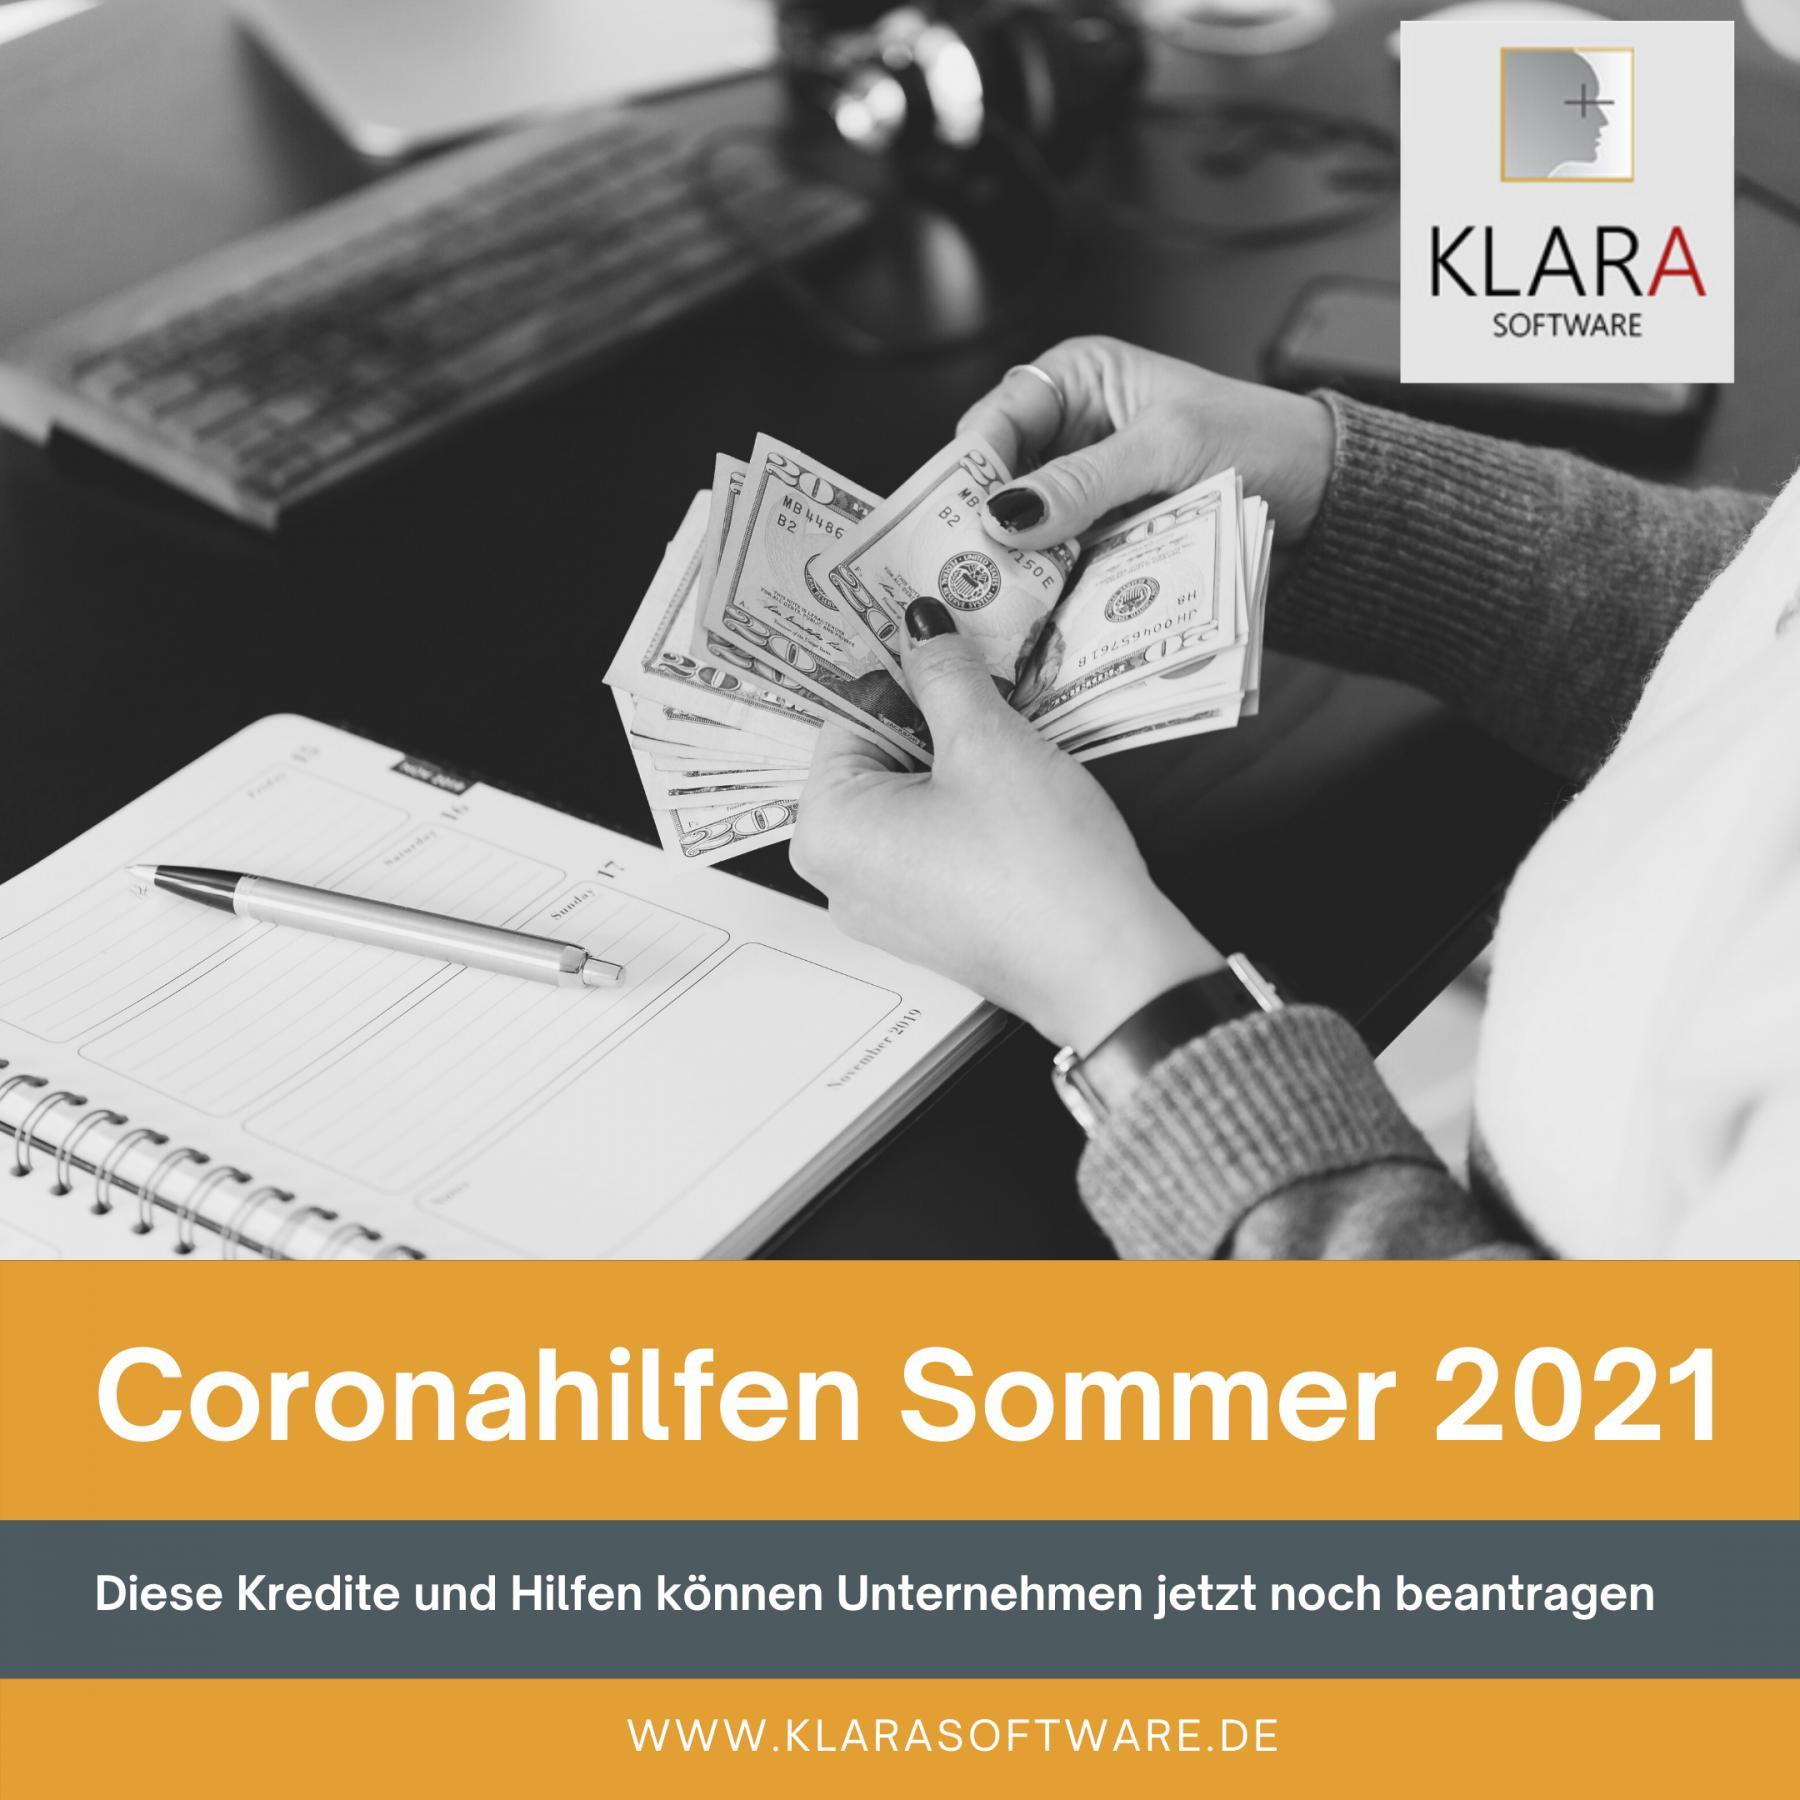 Coronahilfen Sommer 2021